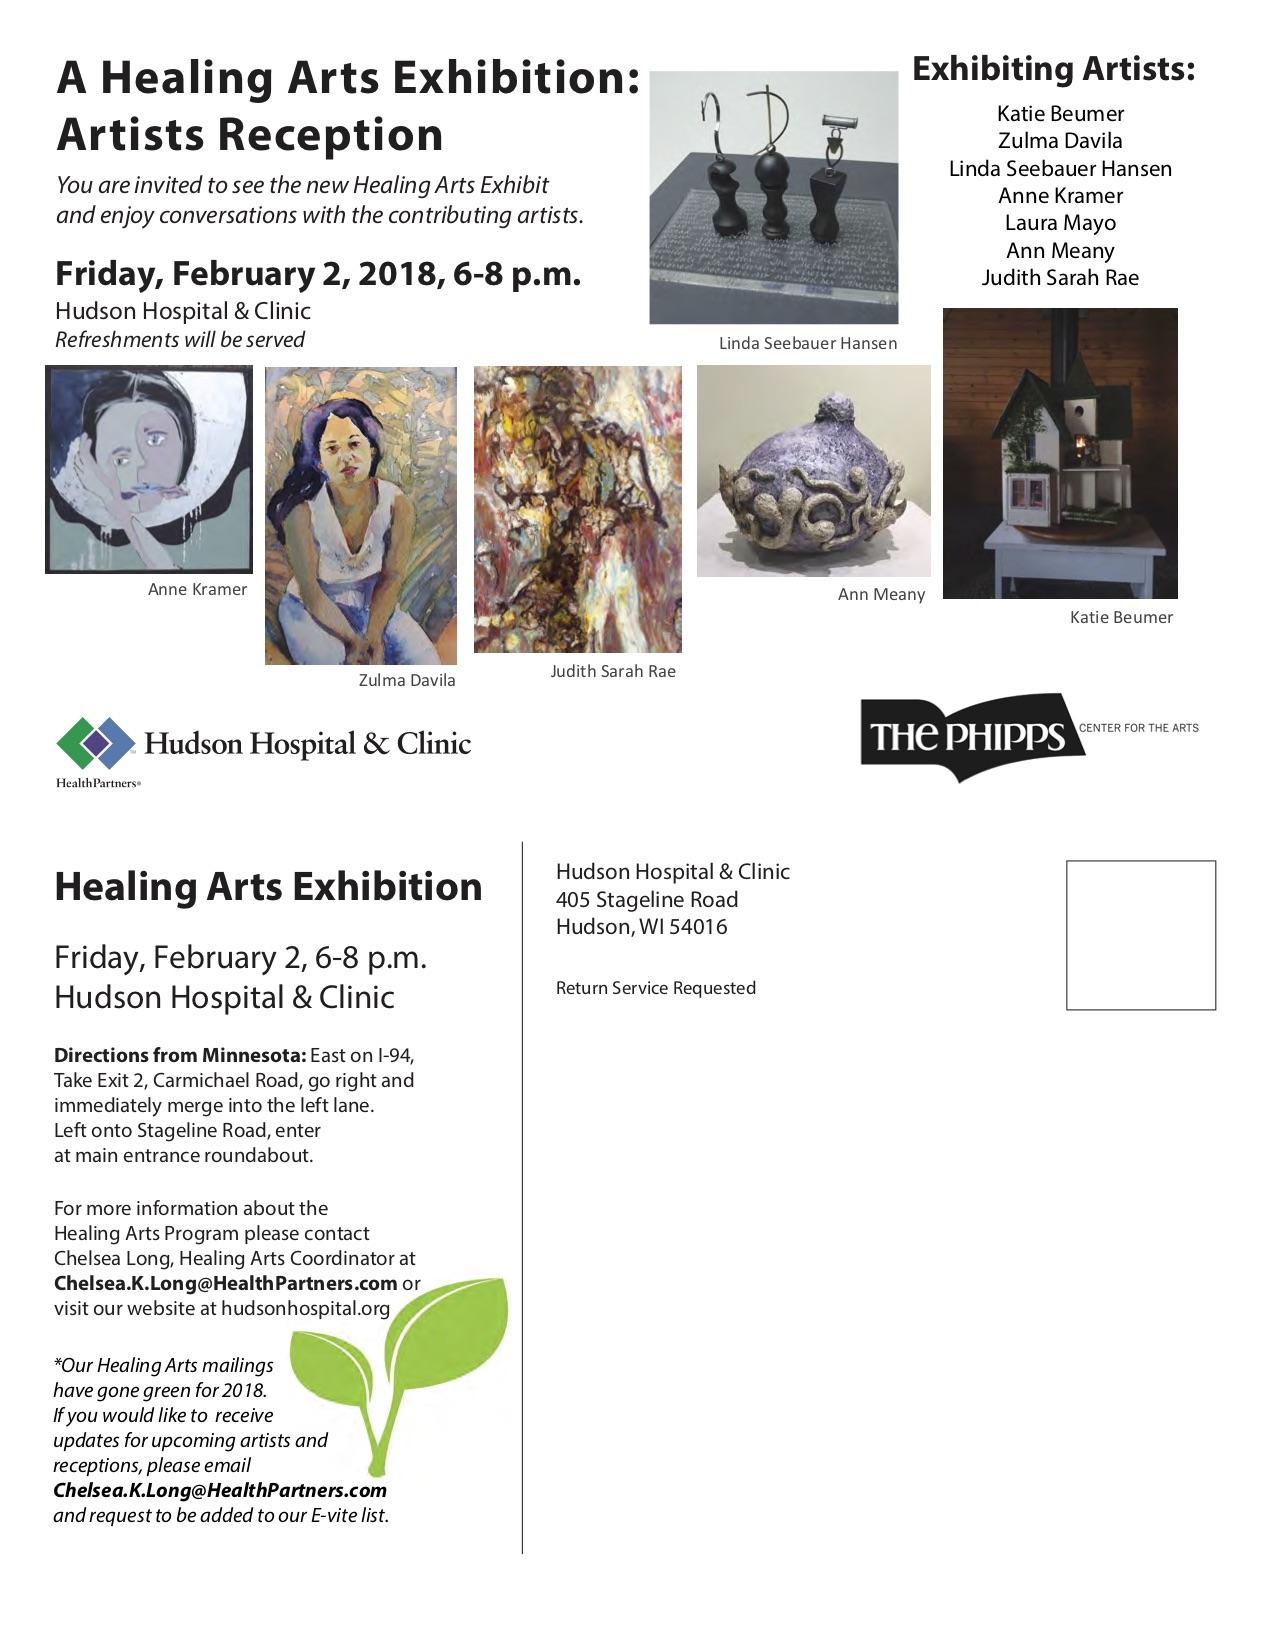 Group Exhibition - November 8, 2017 – February 4, 2018Hudson Hospital & Clinic, Hudson, WI